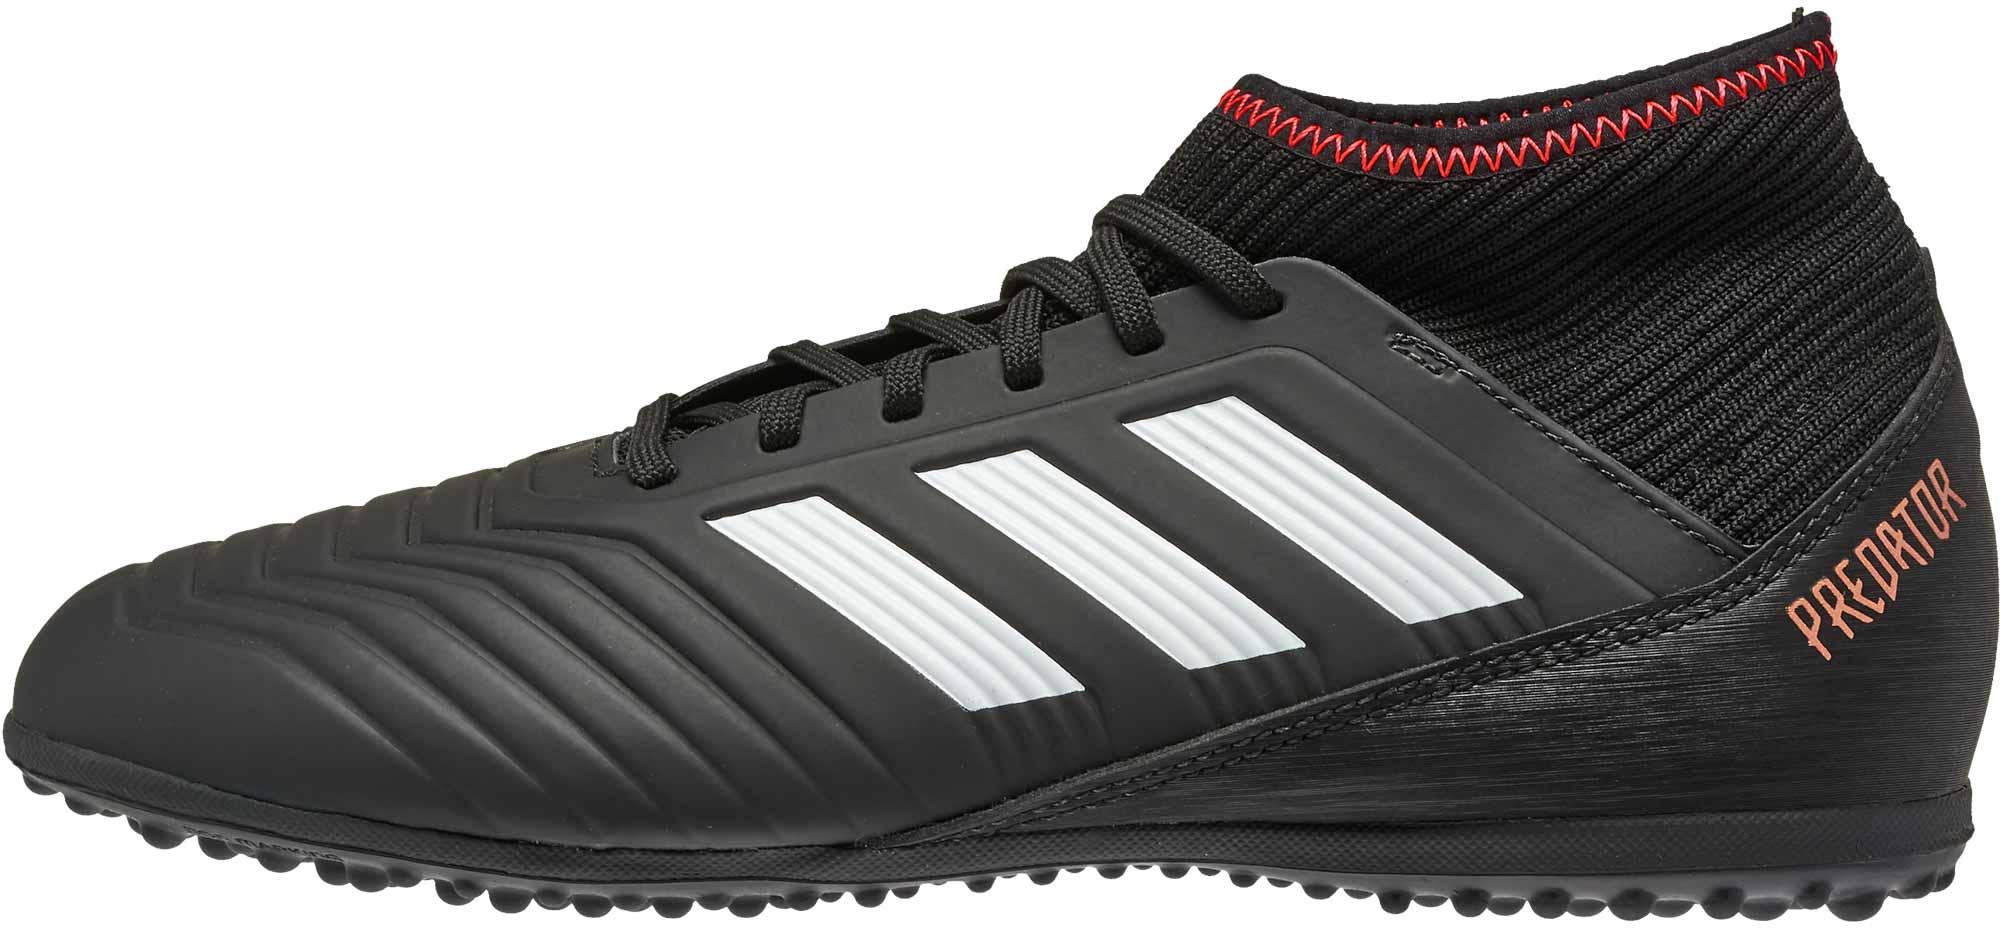 b140fa9aa adidas Kids Predator Tango 18.3 TF - Black/Solar Red - SoccerPro